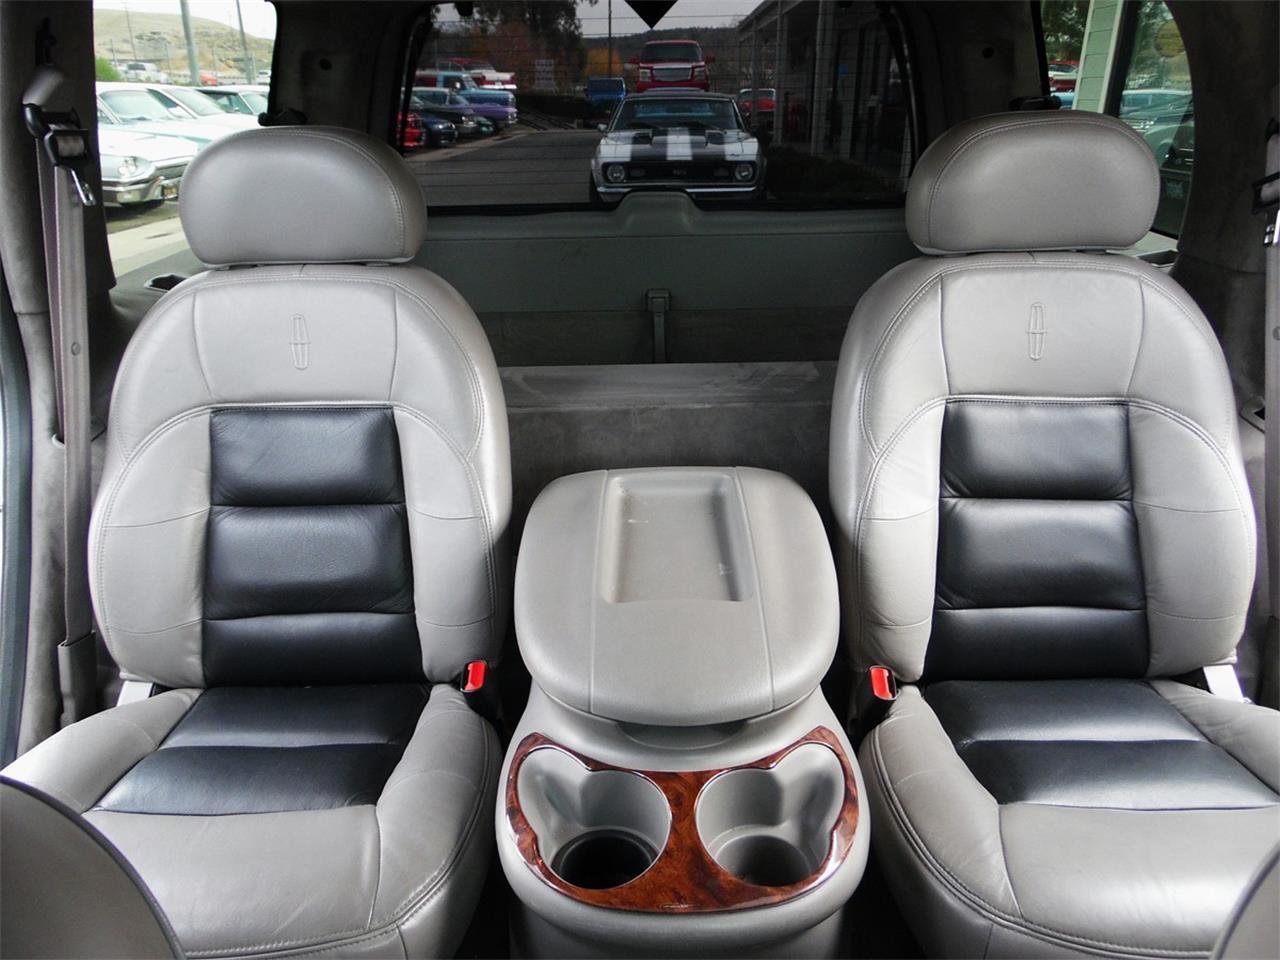 1998 Lincoln Navigator (CC-1174712) for sale in Redlands, California